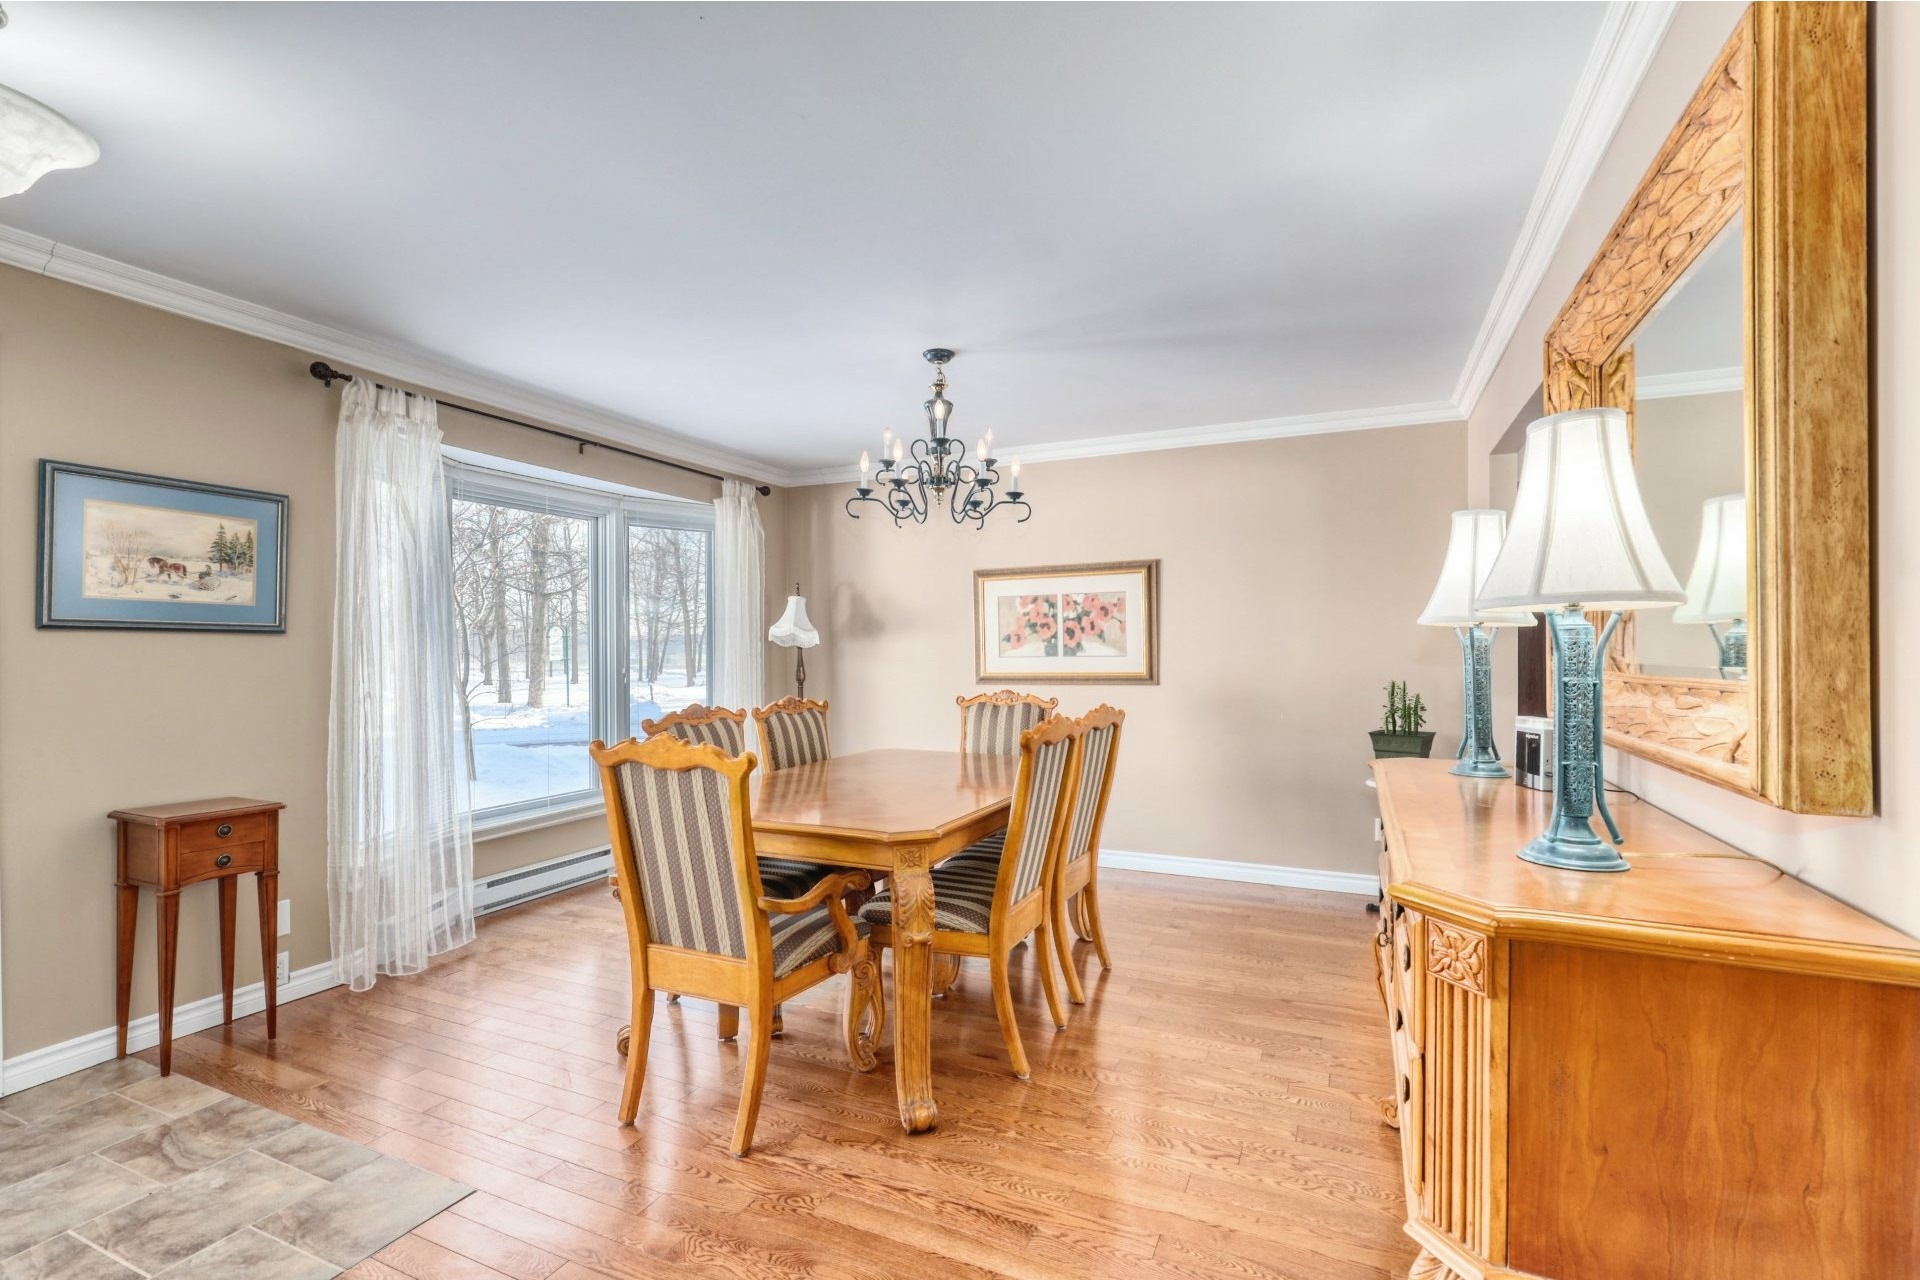 image 8 - House For sale Terrebonne Terrebonne  - 8 rooms